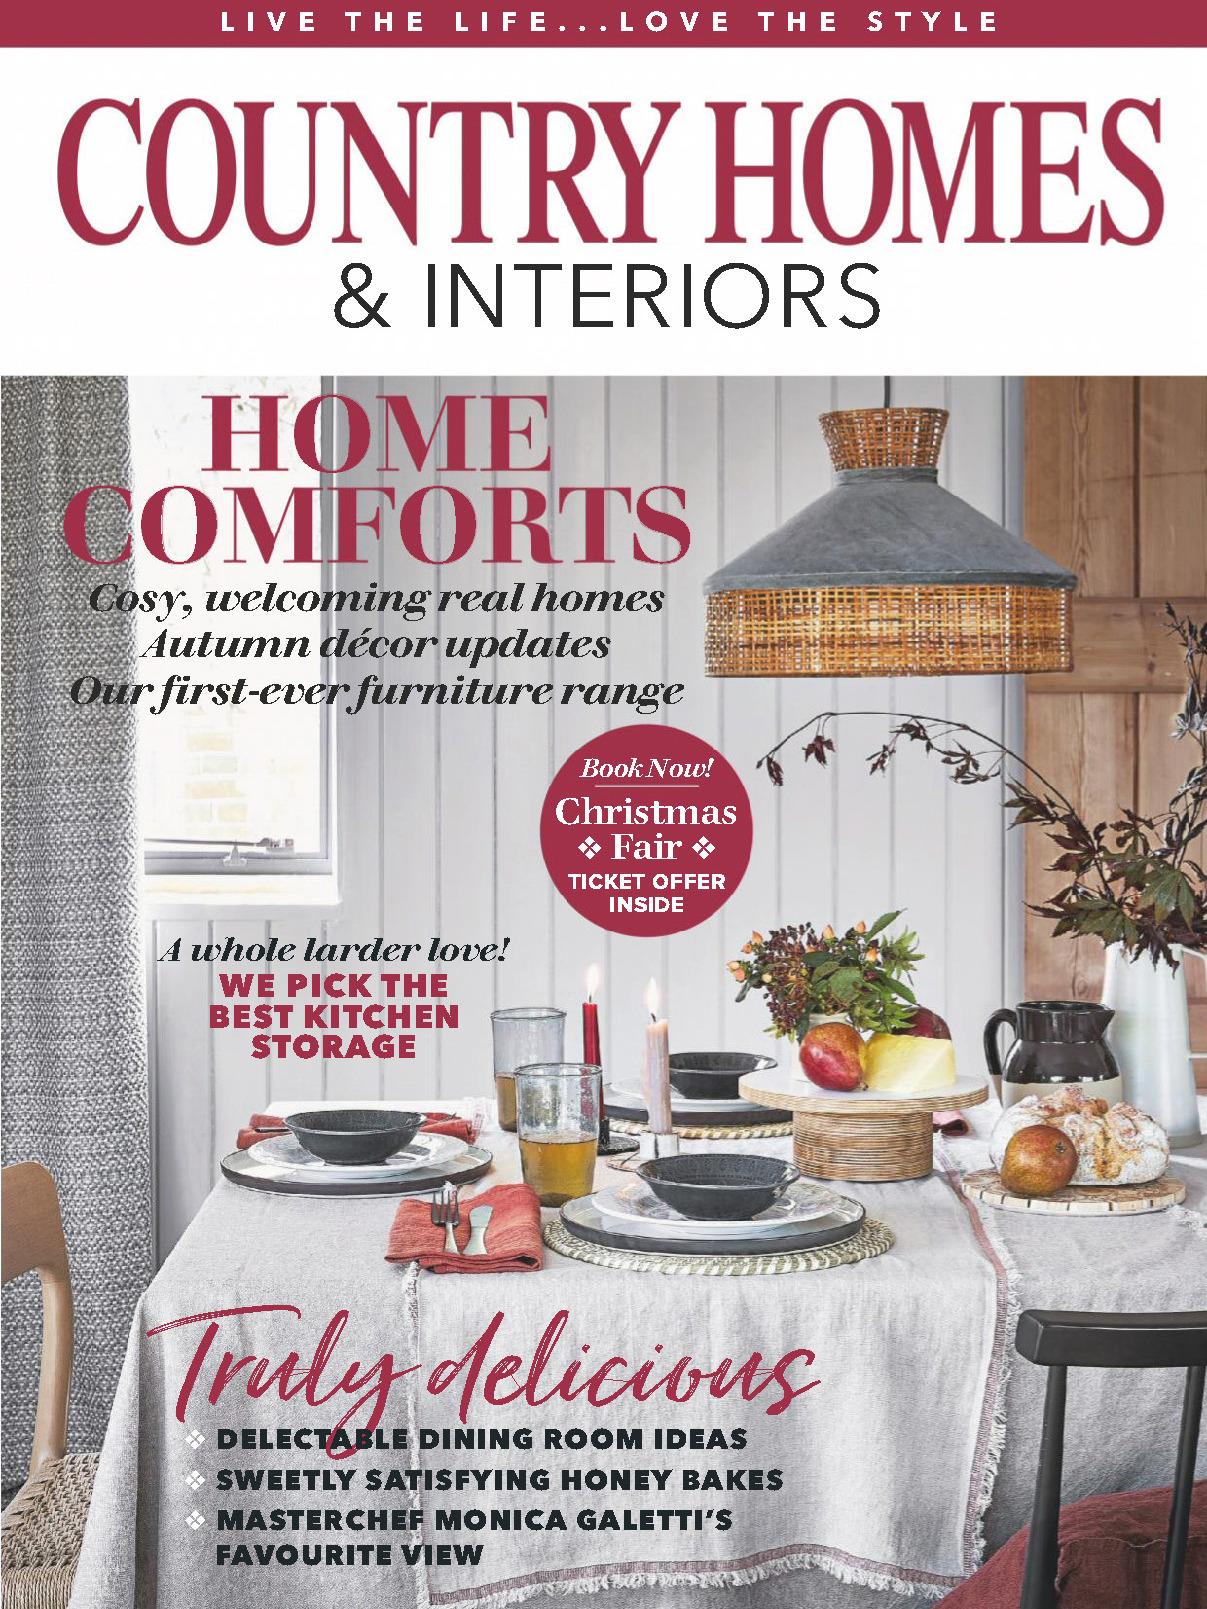 《Country Homes & Interiors》英國家居裝飾雜志2019年11月號